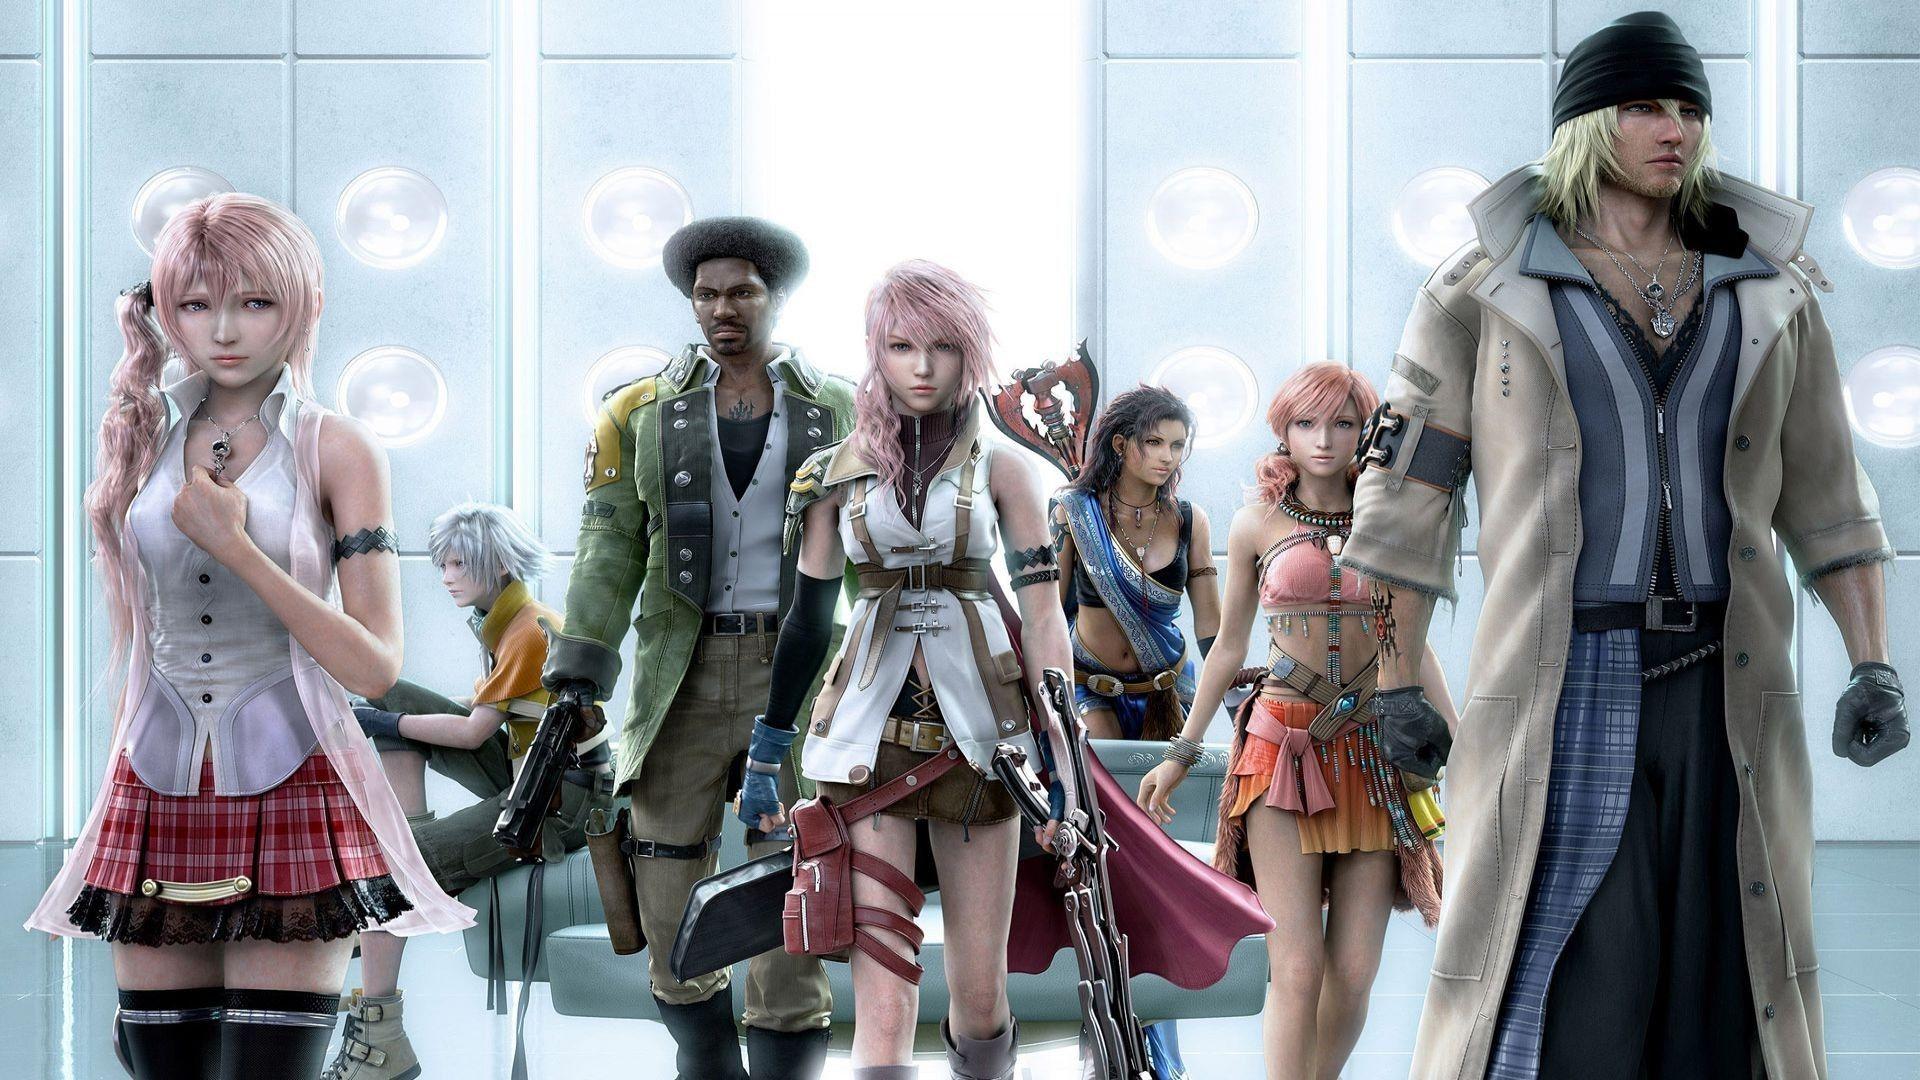 Download Free Final Fantasy 13 Wallpaper 3 Wallpaper Background Hd